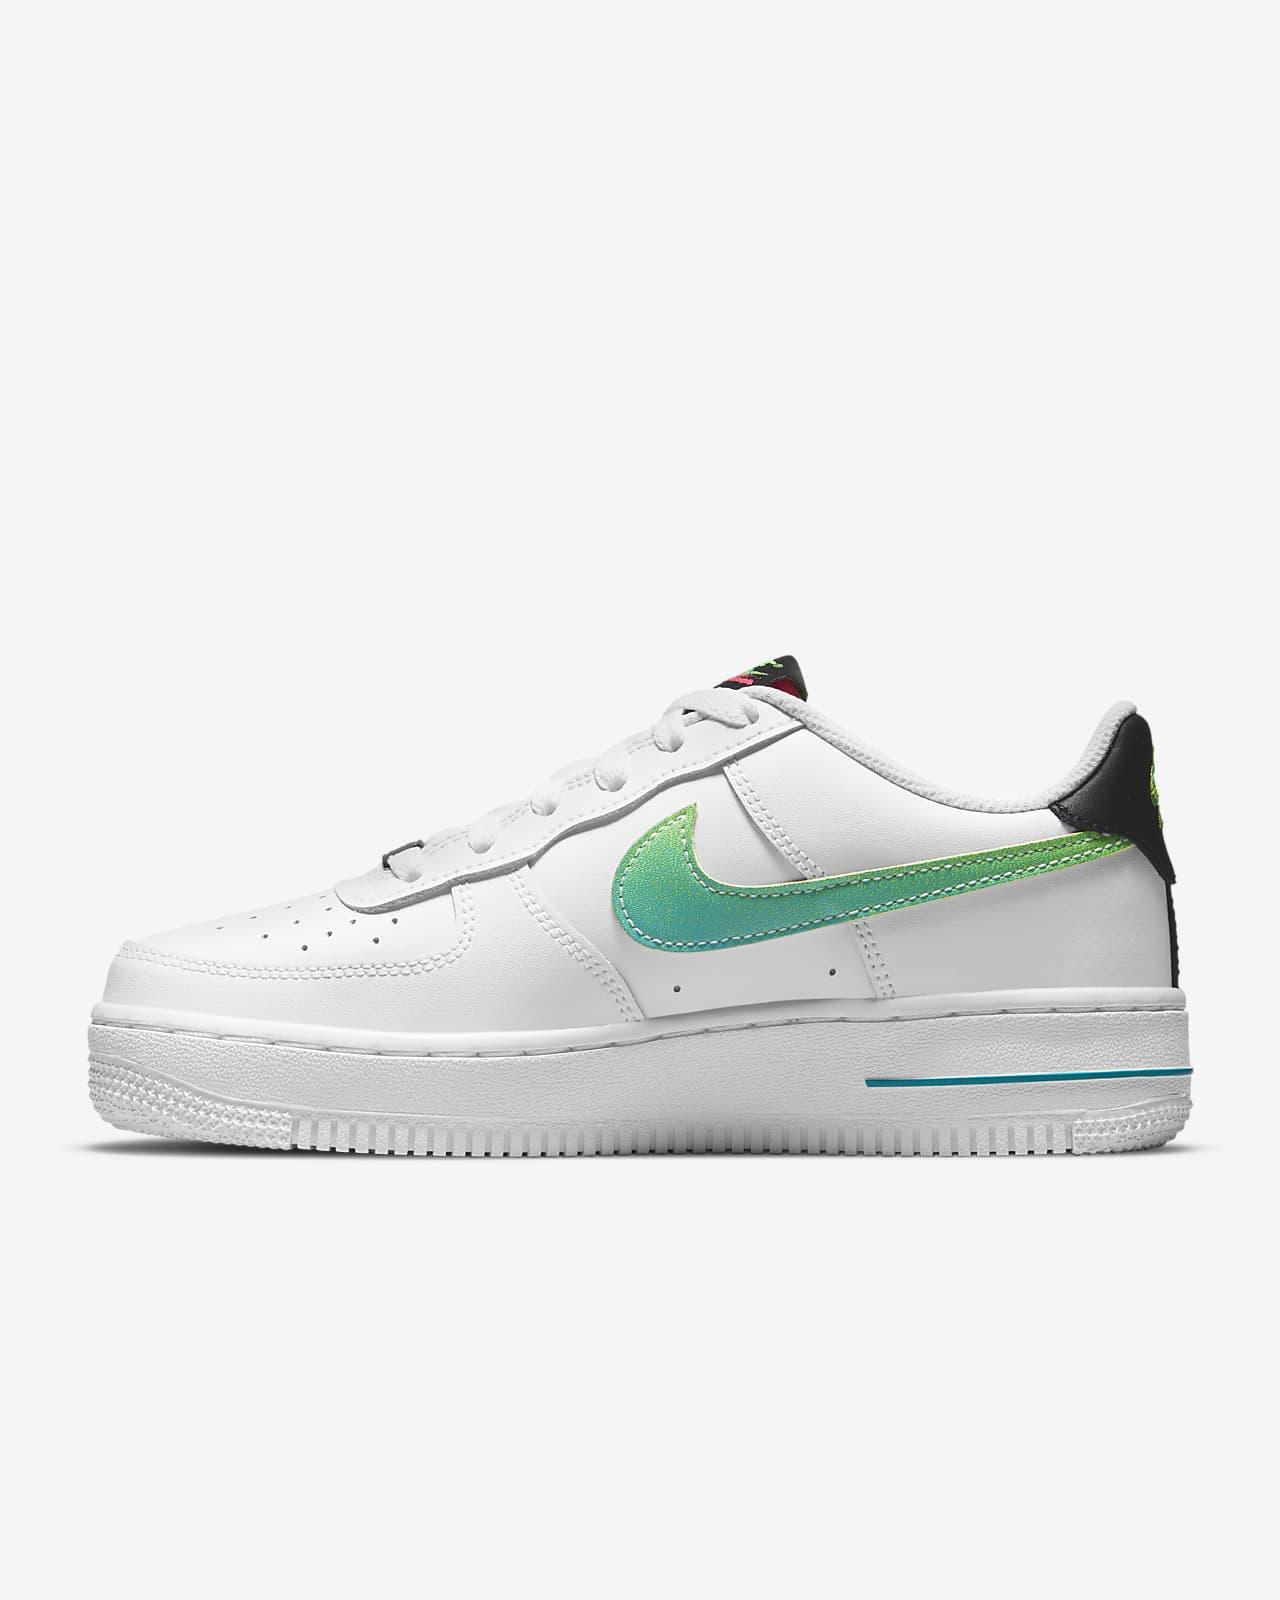 Calzado para niños talla grande Nike Air Force 1 LV8 1